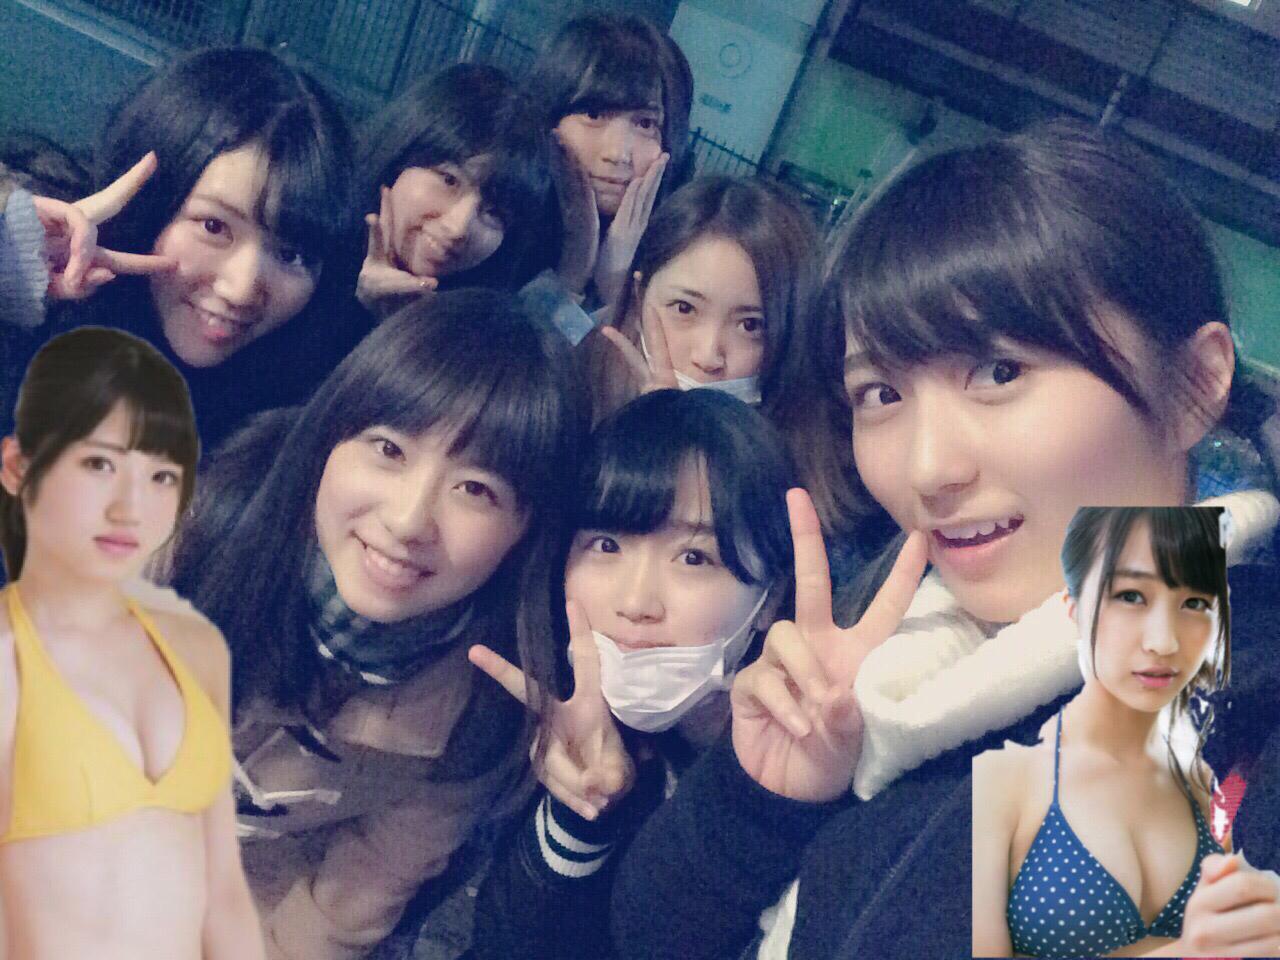 AKB48】相笠萌応援スレ★66【もえちゃん】世界には相笠しかない💕©2ch.netYouTube動画>1本 ->画像>250枚